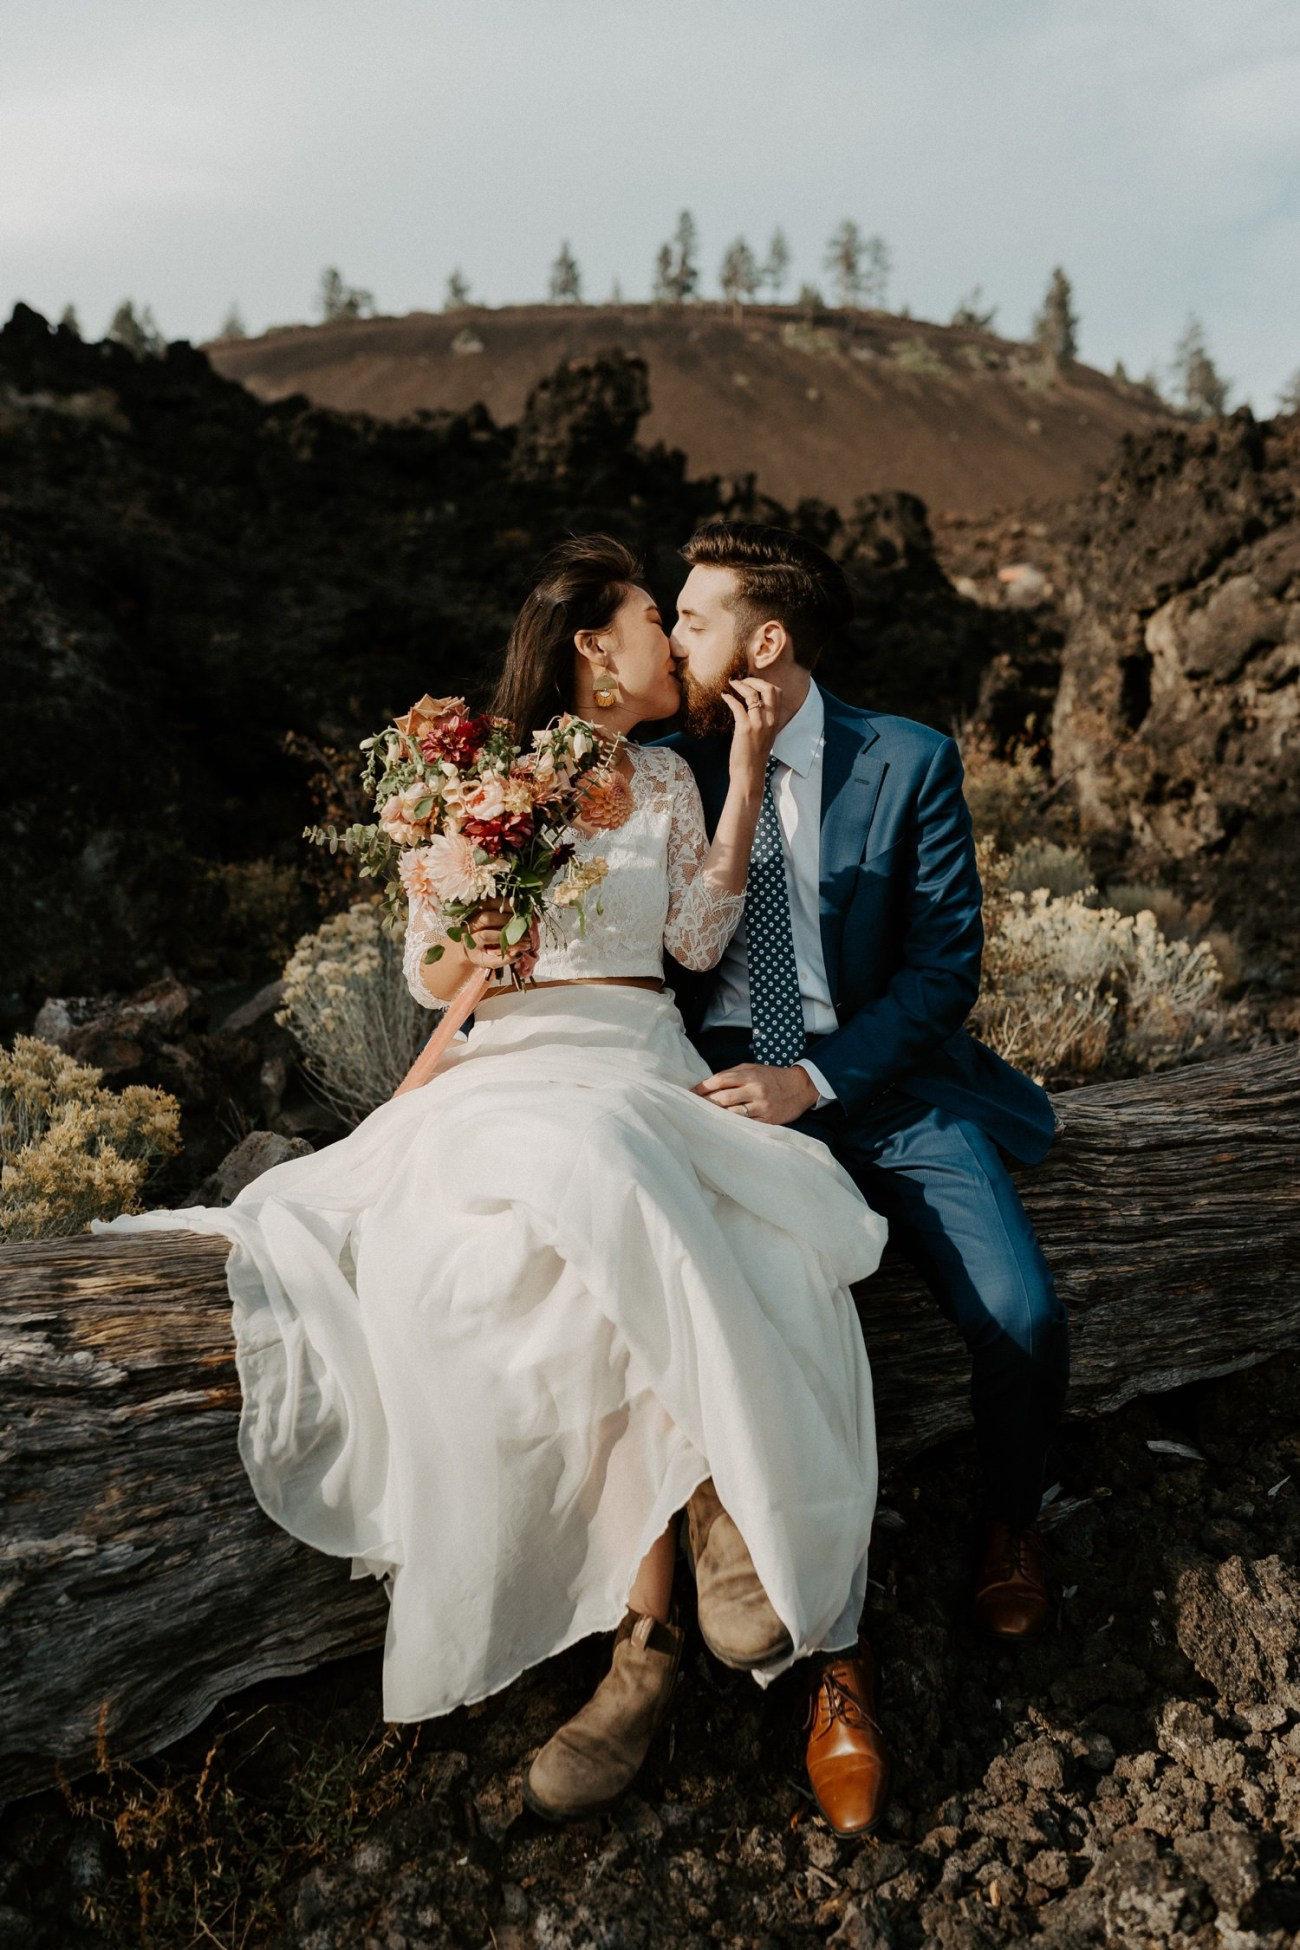 Newberry Volcano Elopement Bend Elopement Bridal Session Bend Wedding Photographer Anais Possamai Photography 016